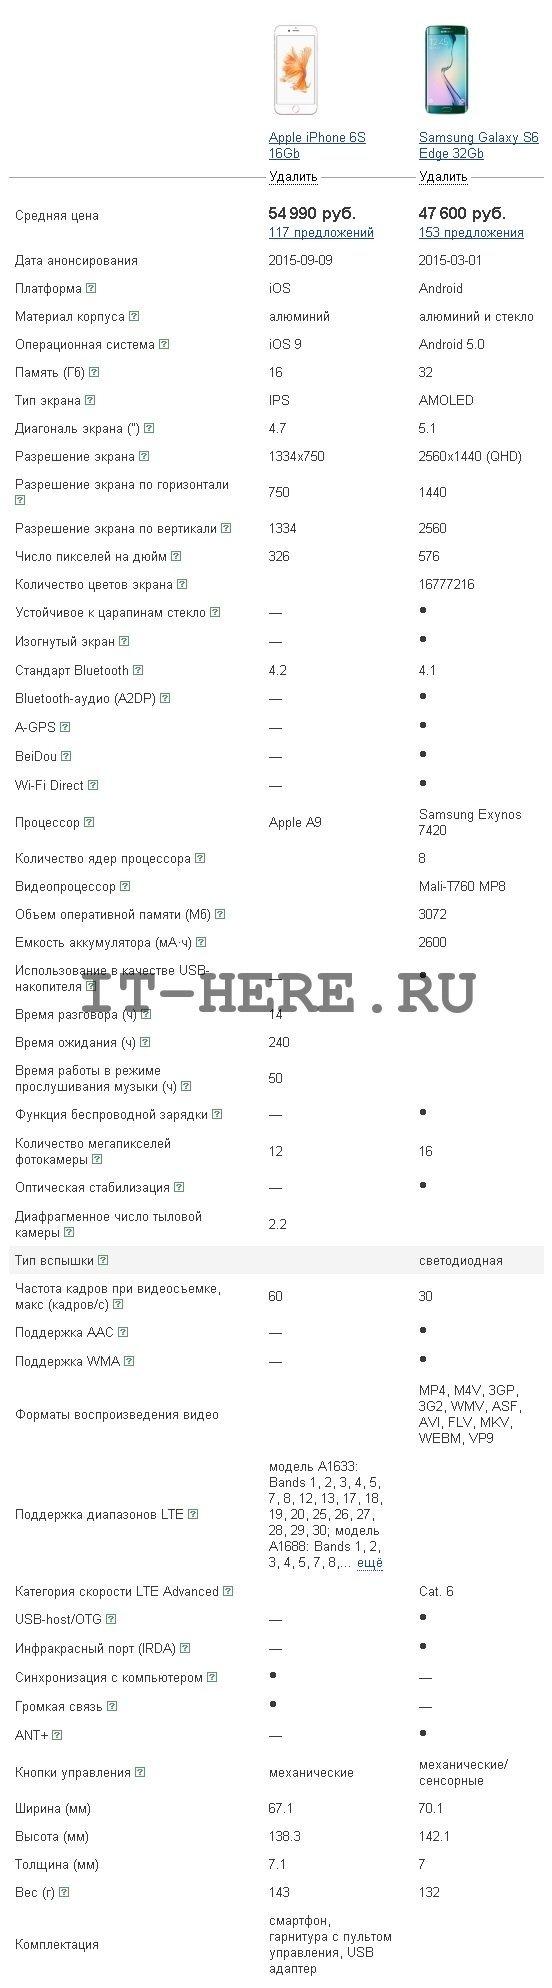 Сравнение iPhone 6s и galaxy s6